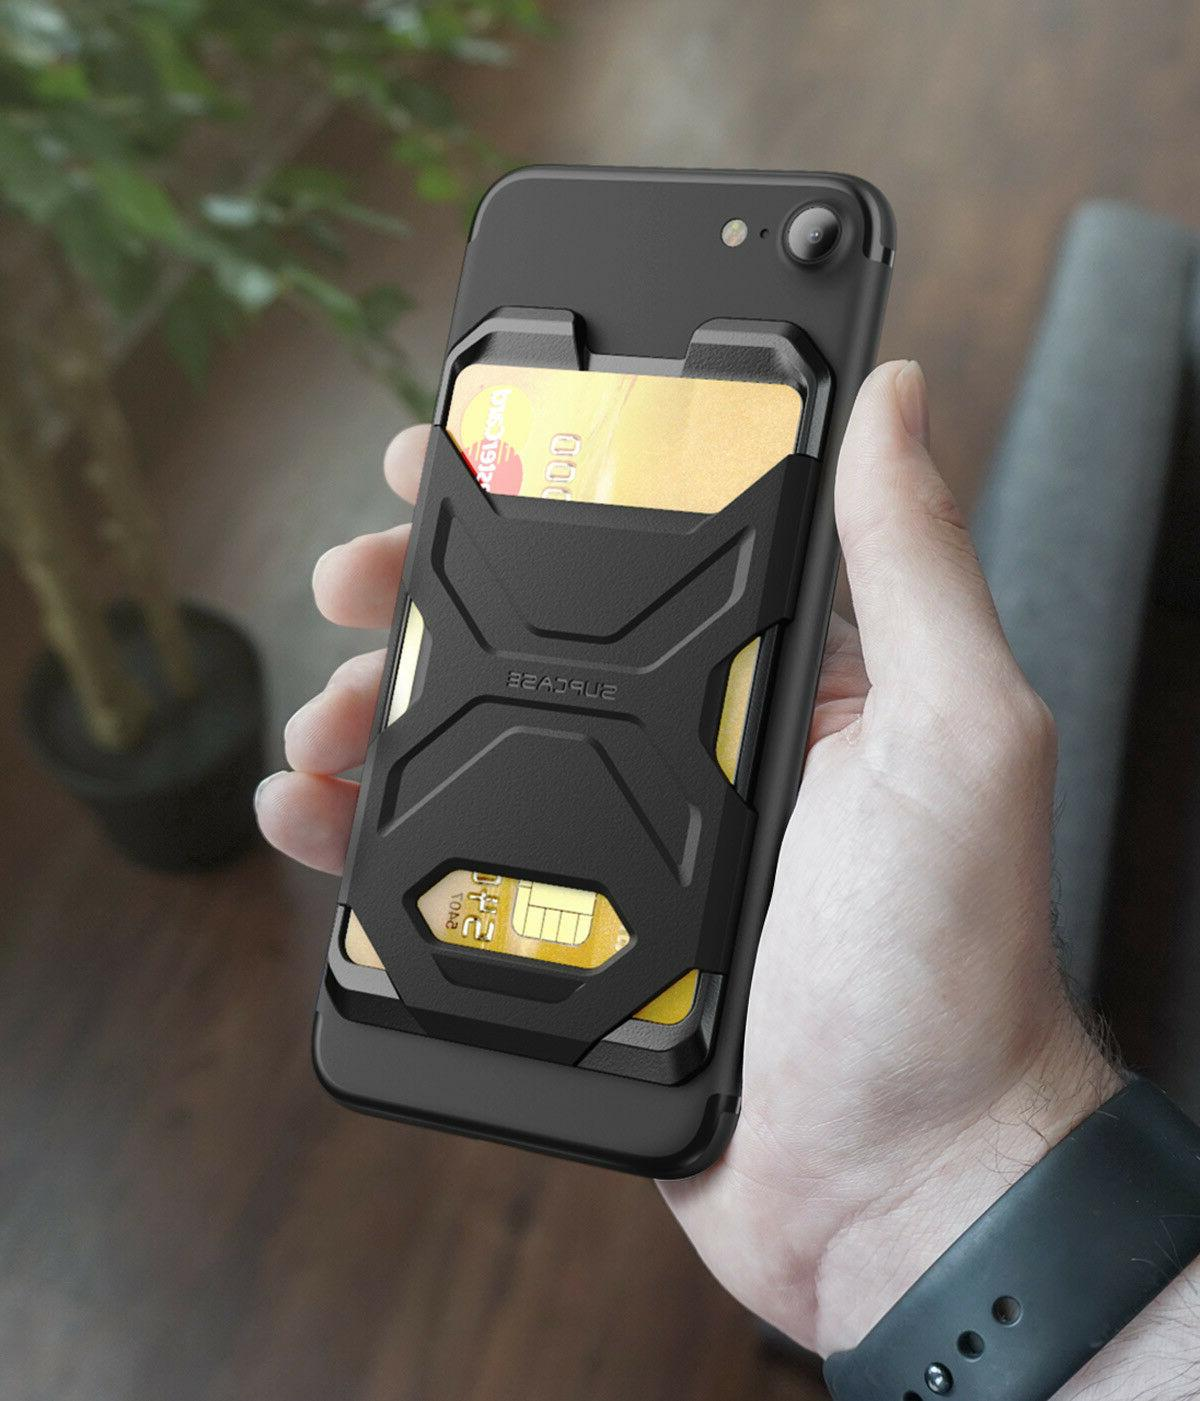 SUPCASE Adhesive Slim Credit Card Cell Phone